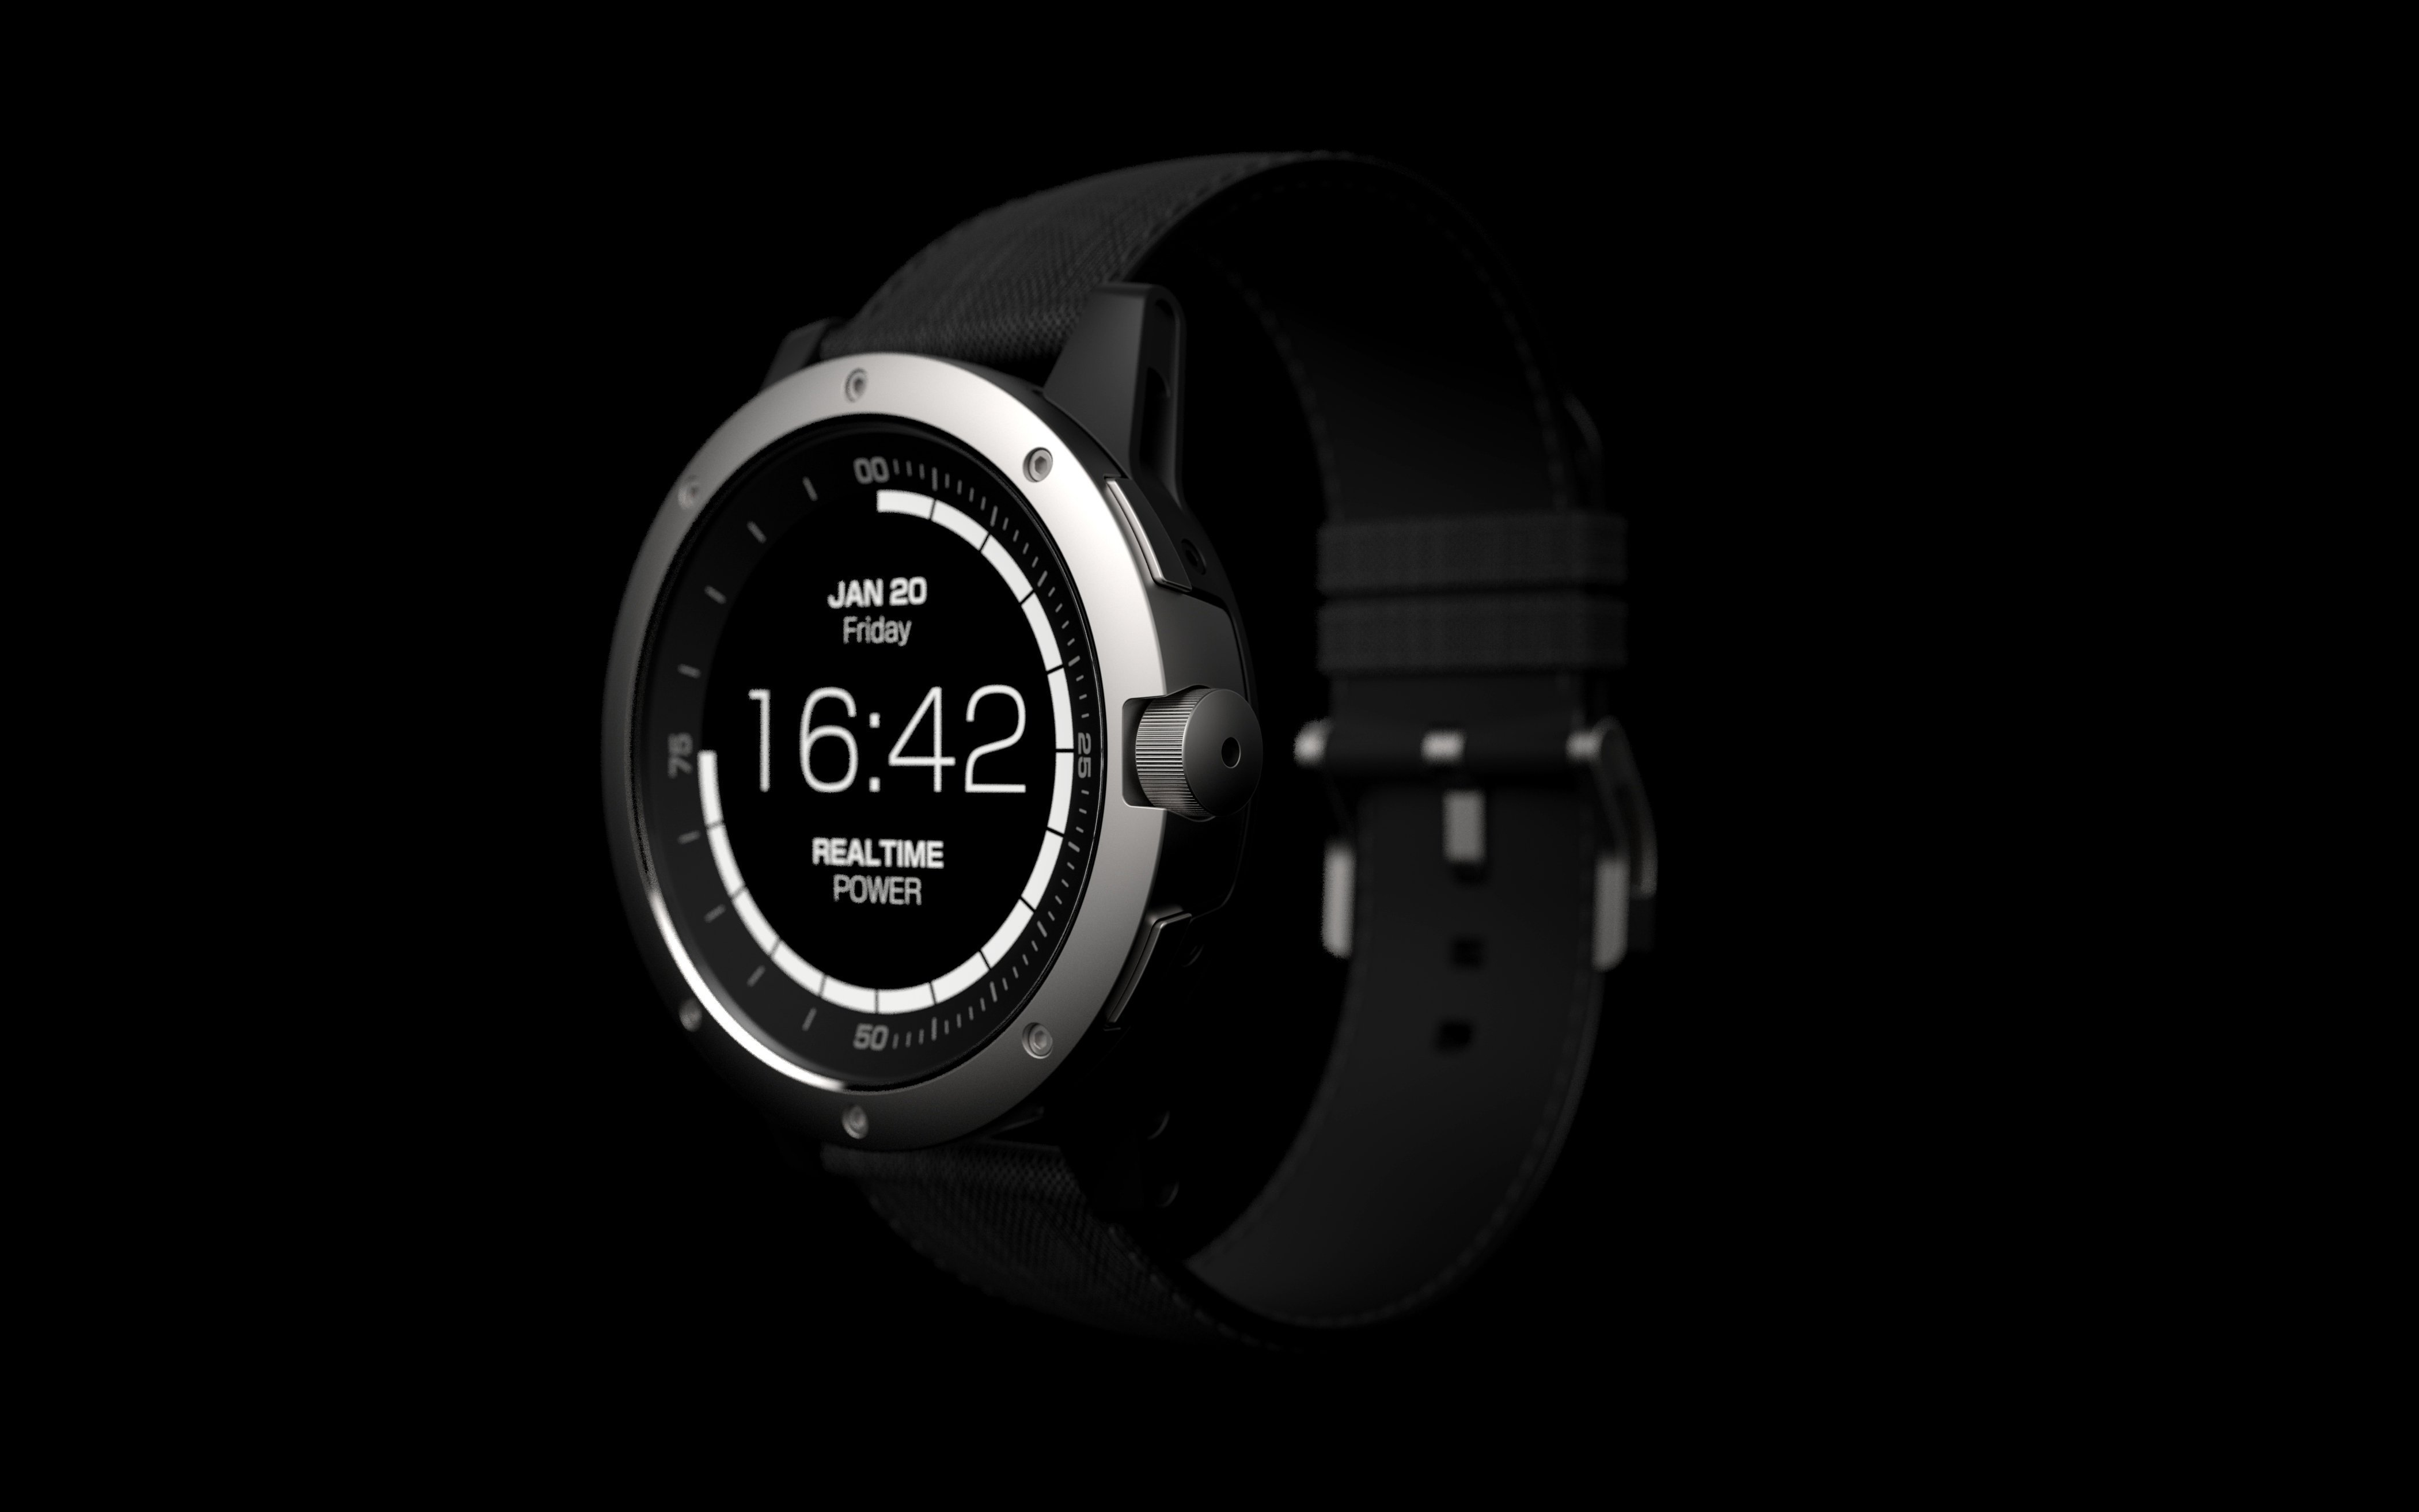 Matrix PowerWatch is a smartwatch powered only by body heat